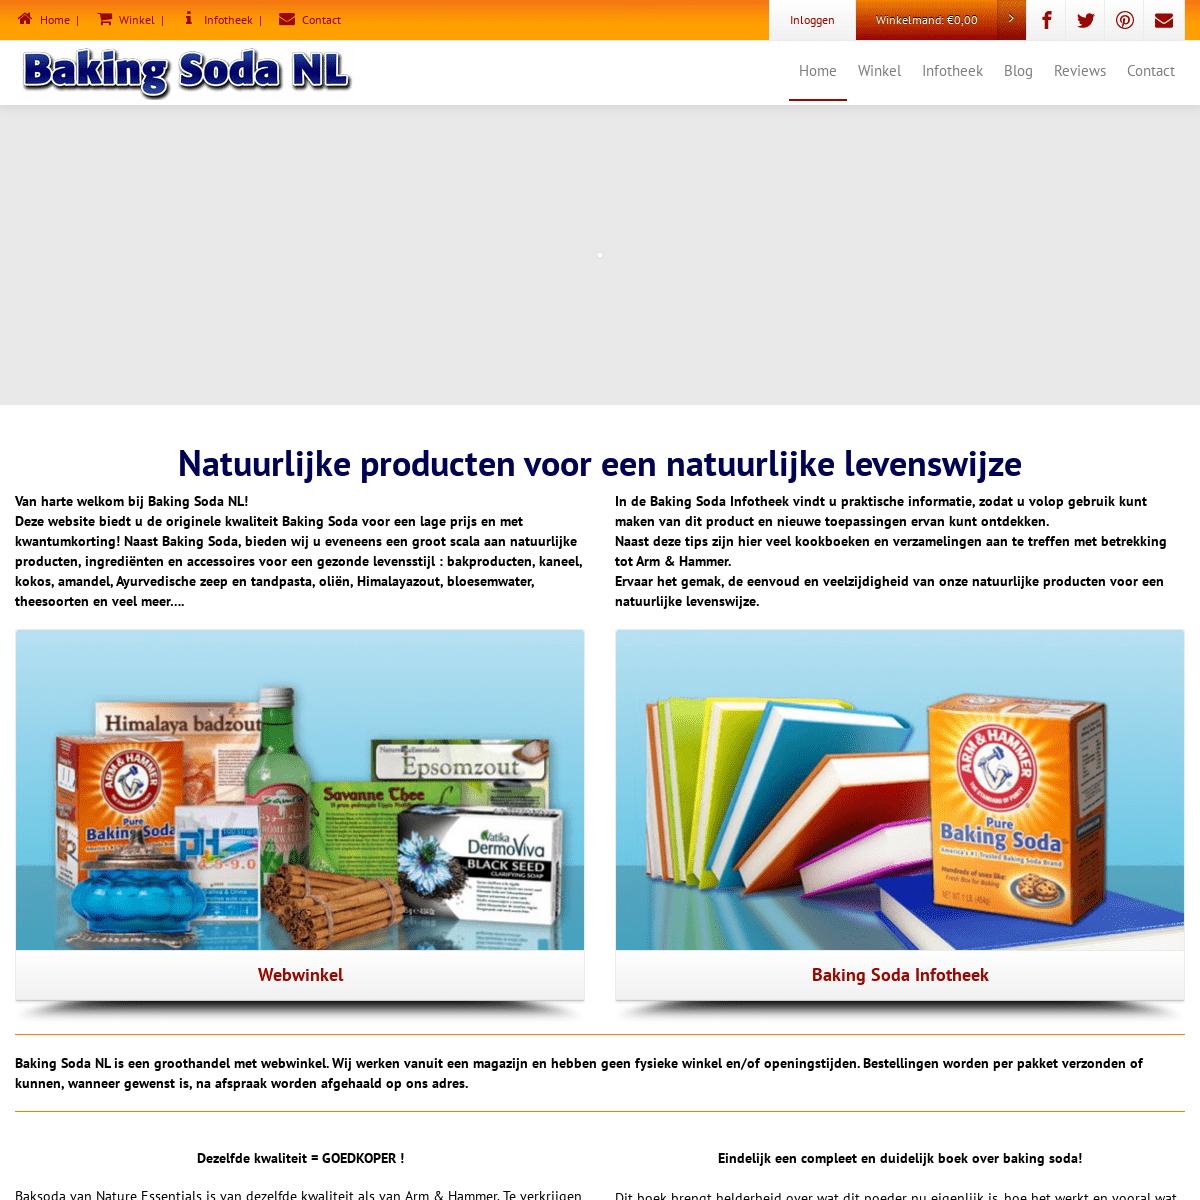 ArchiveBay.com - baking-soda.nl - Baking Soda NL - Grootste leverancier van baking soda in de Benelux